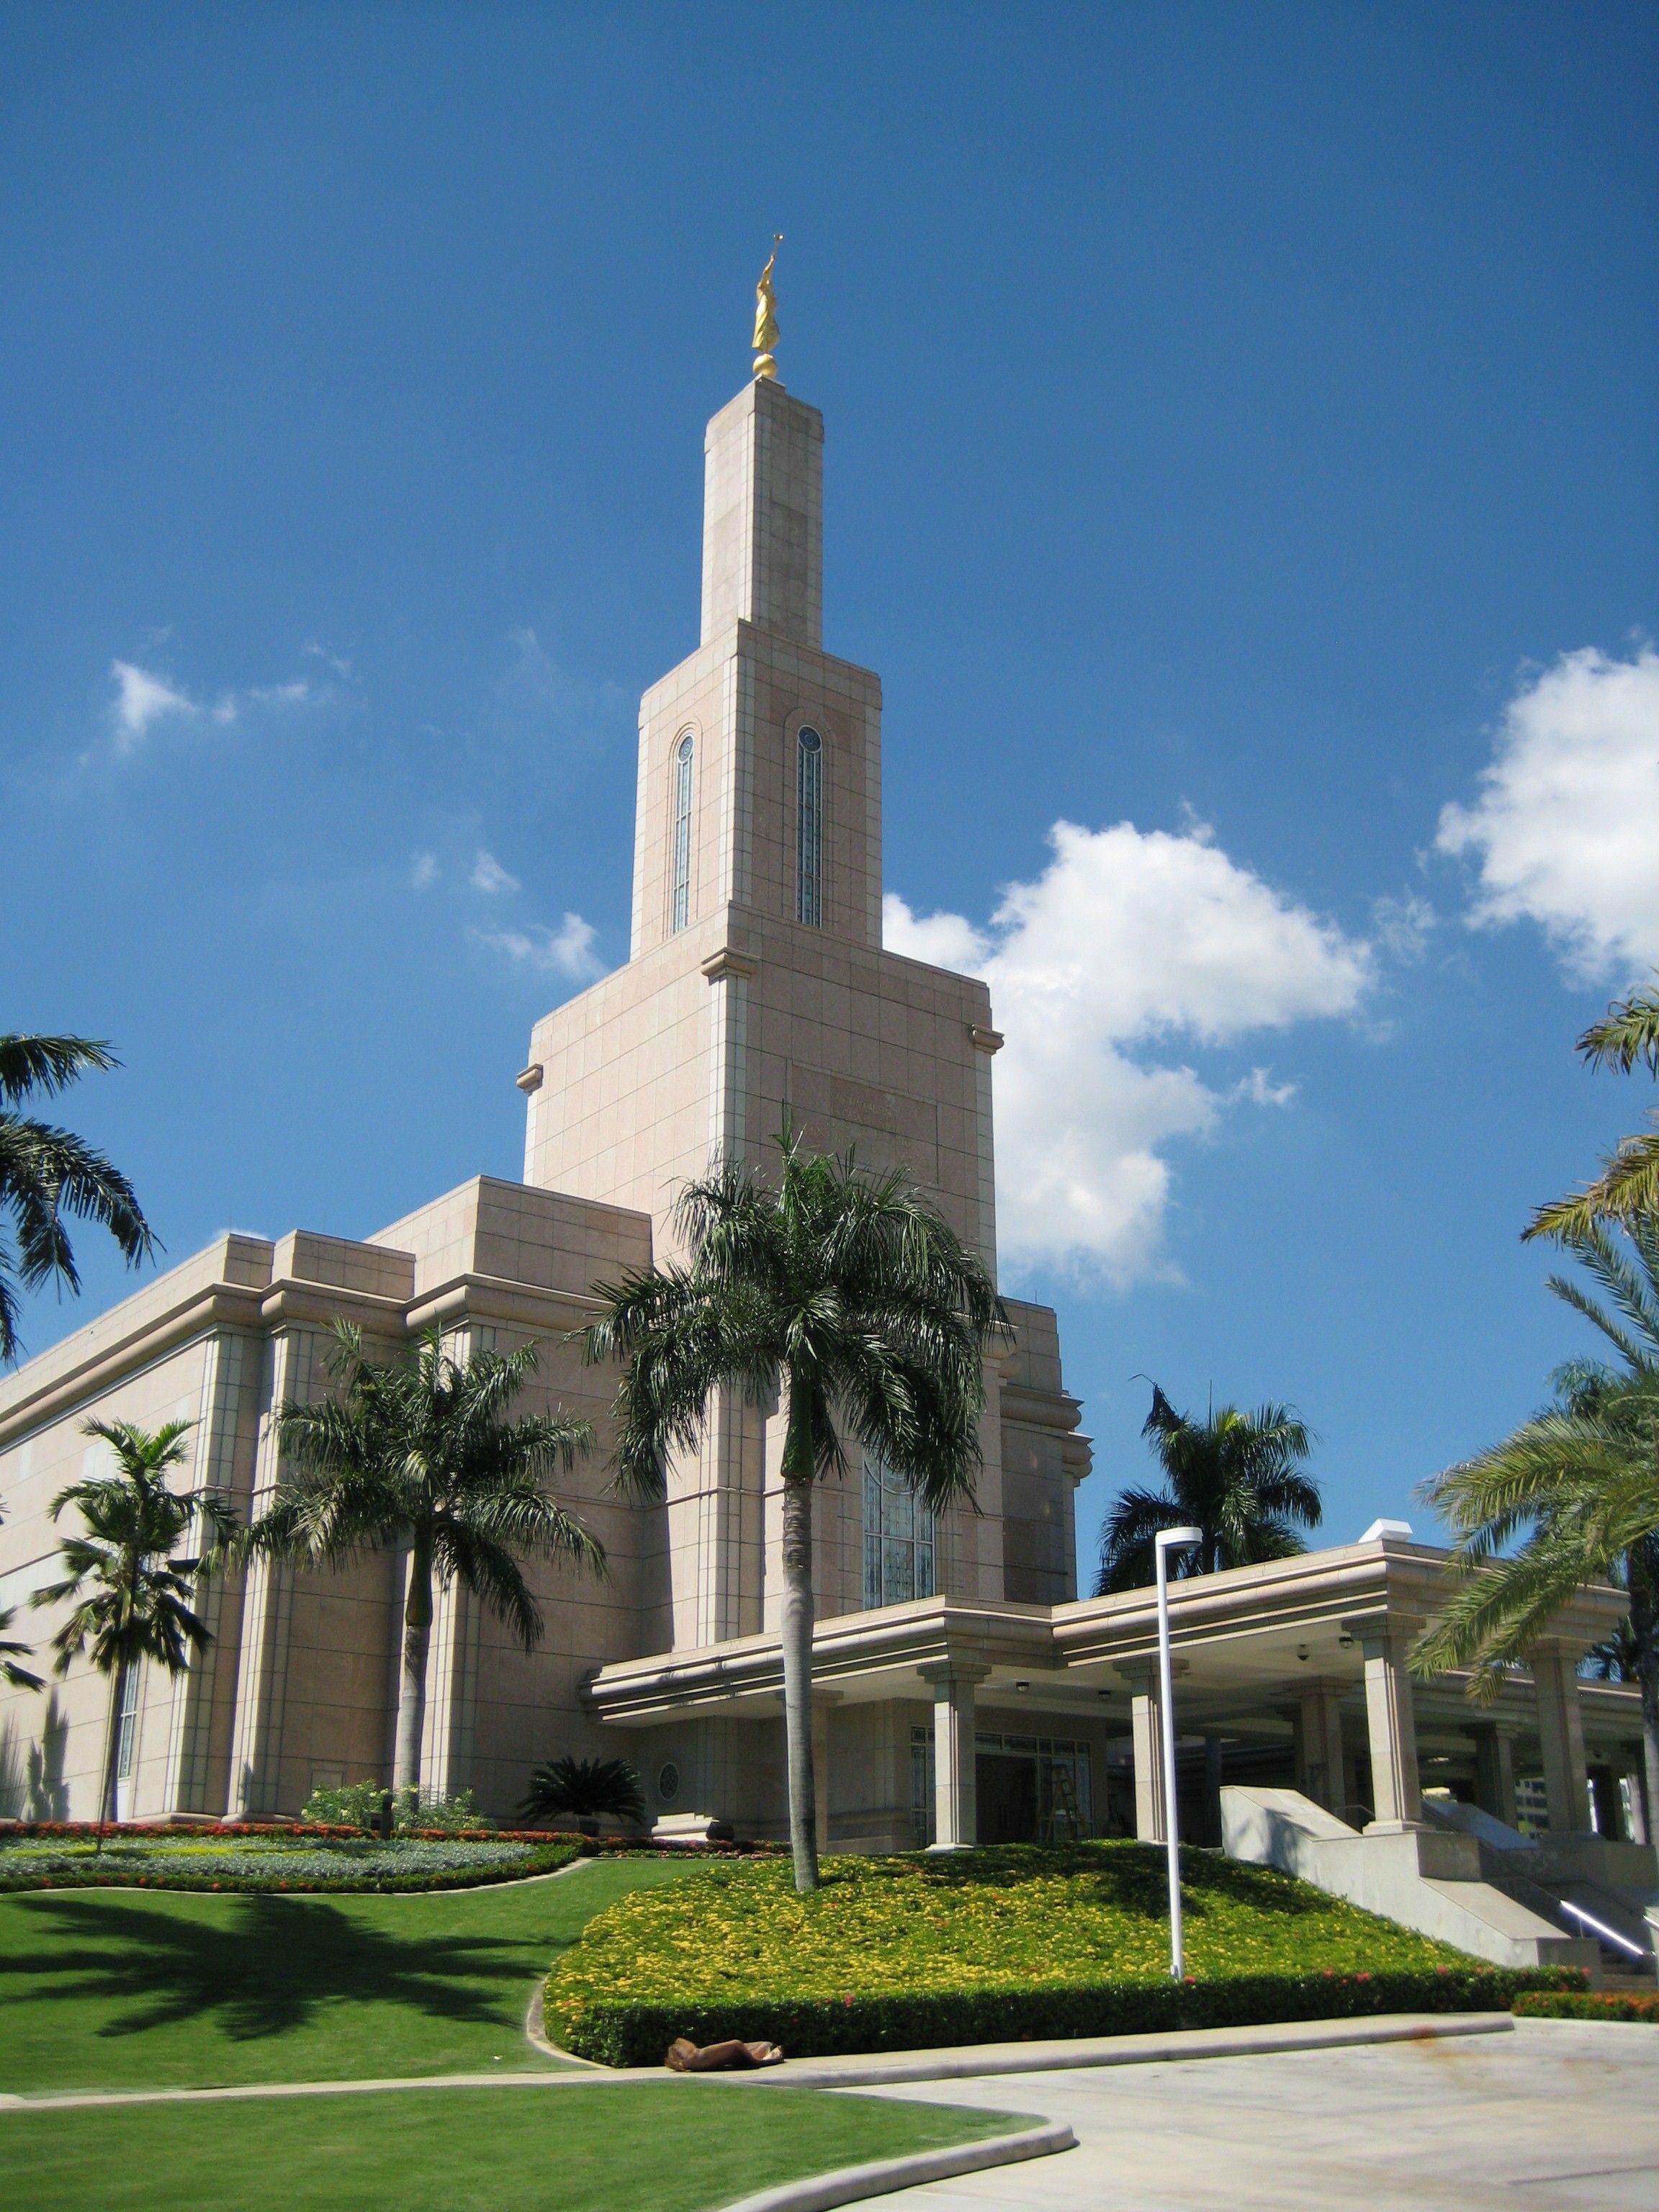 The Santo Domingo Dominican Republic Temple, including the entrance and scenery.